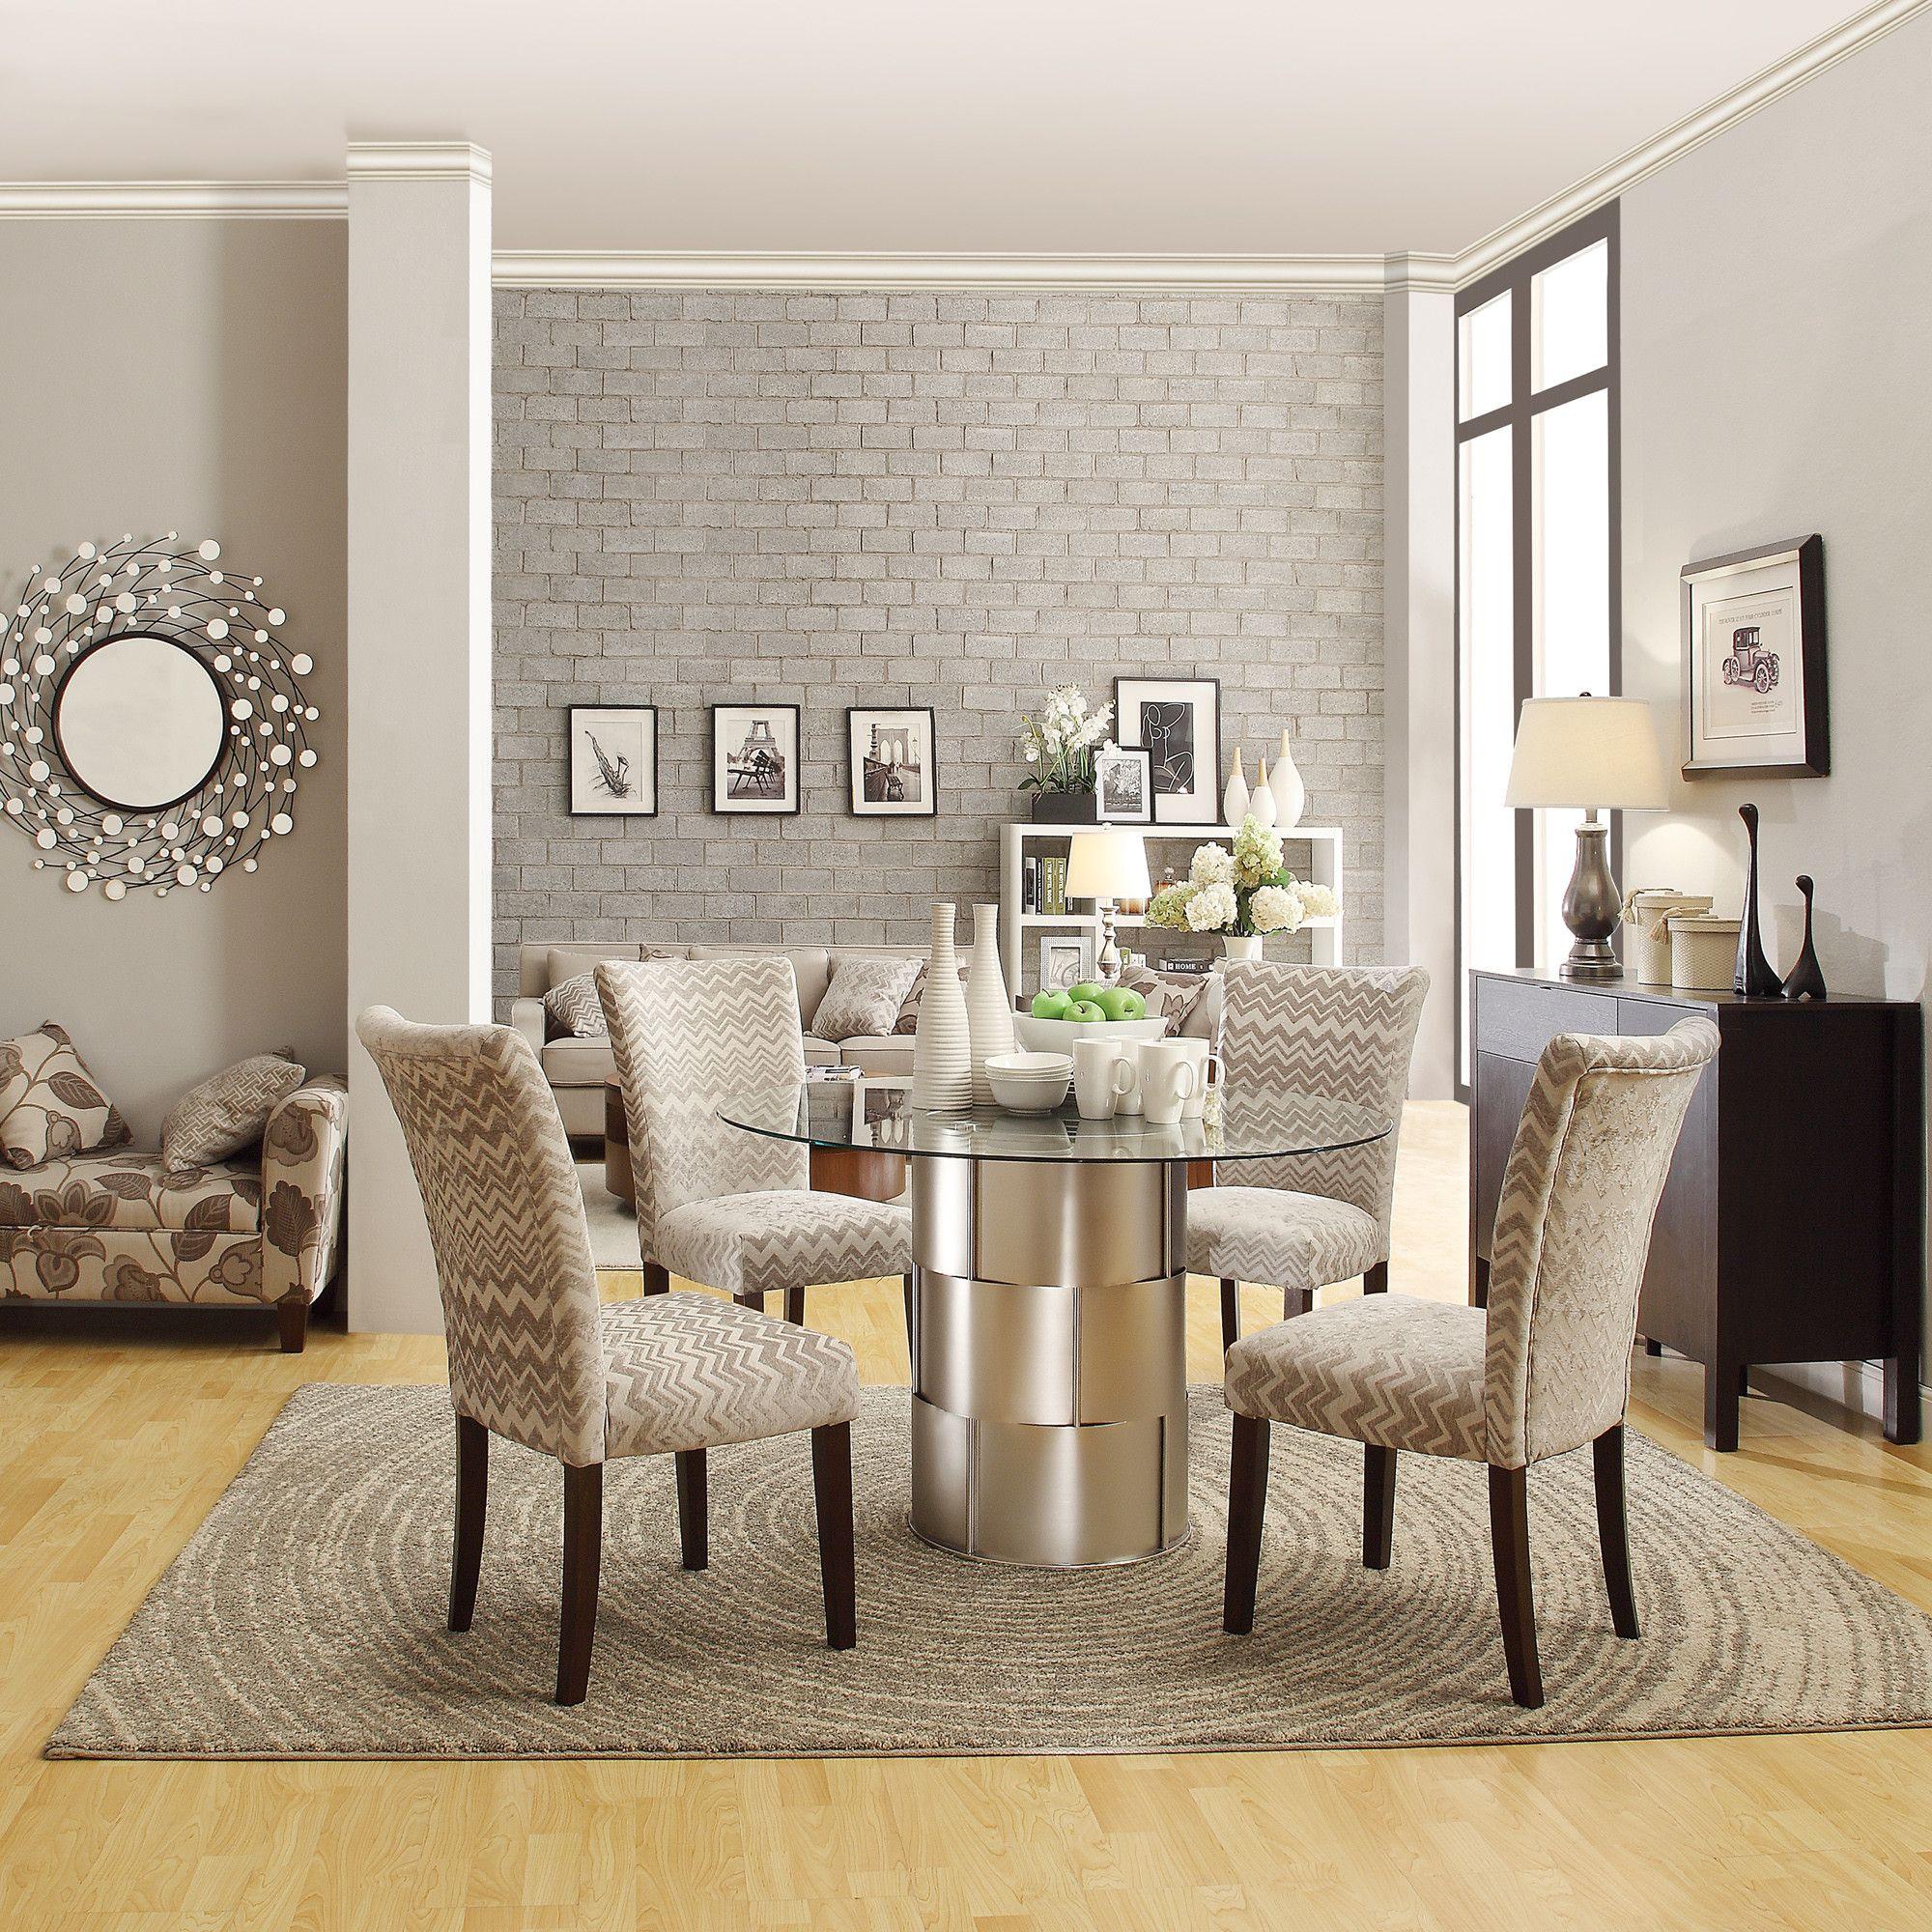 Kingstown Home Emanuella 5 Piece Dining Set & Reviews | Wayfair